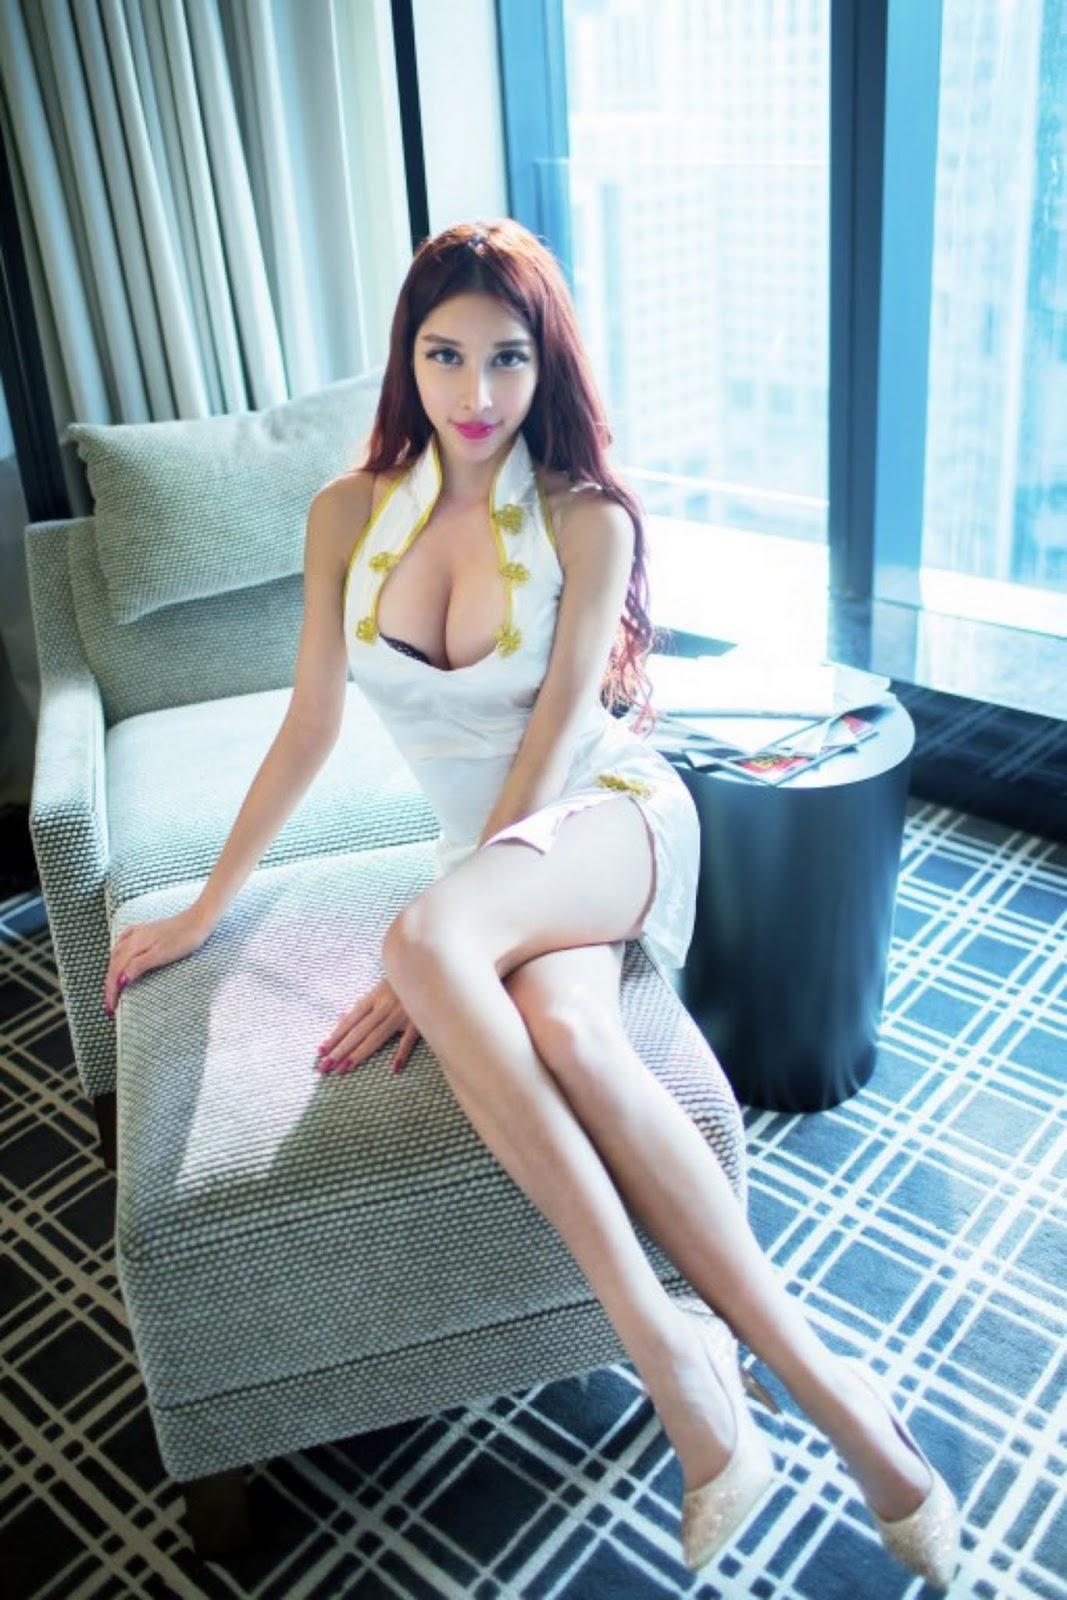 %25C2%25B1 %25C2%25B1 09 - Model Nude TUIGIRL NO.49 Beauty Body Tits